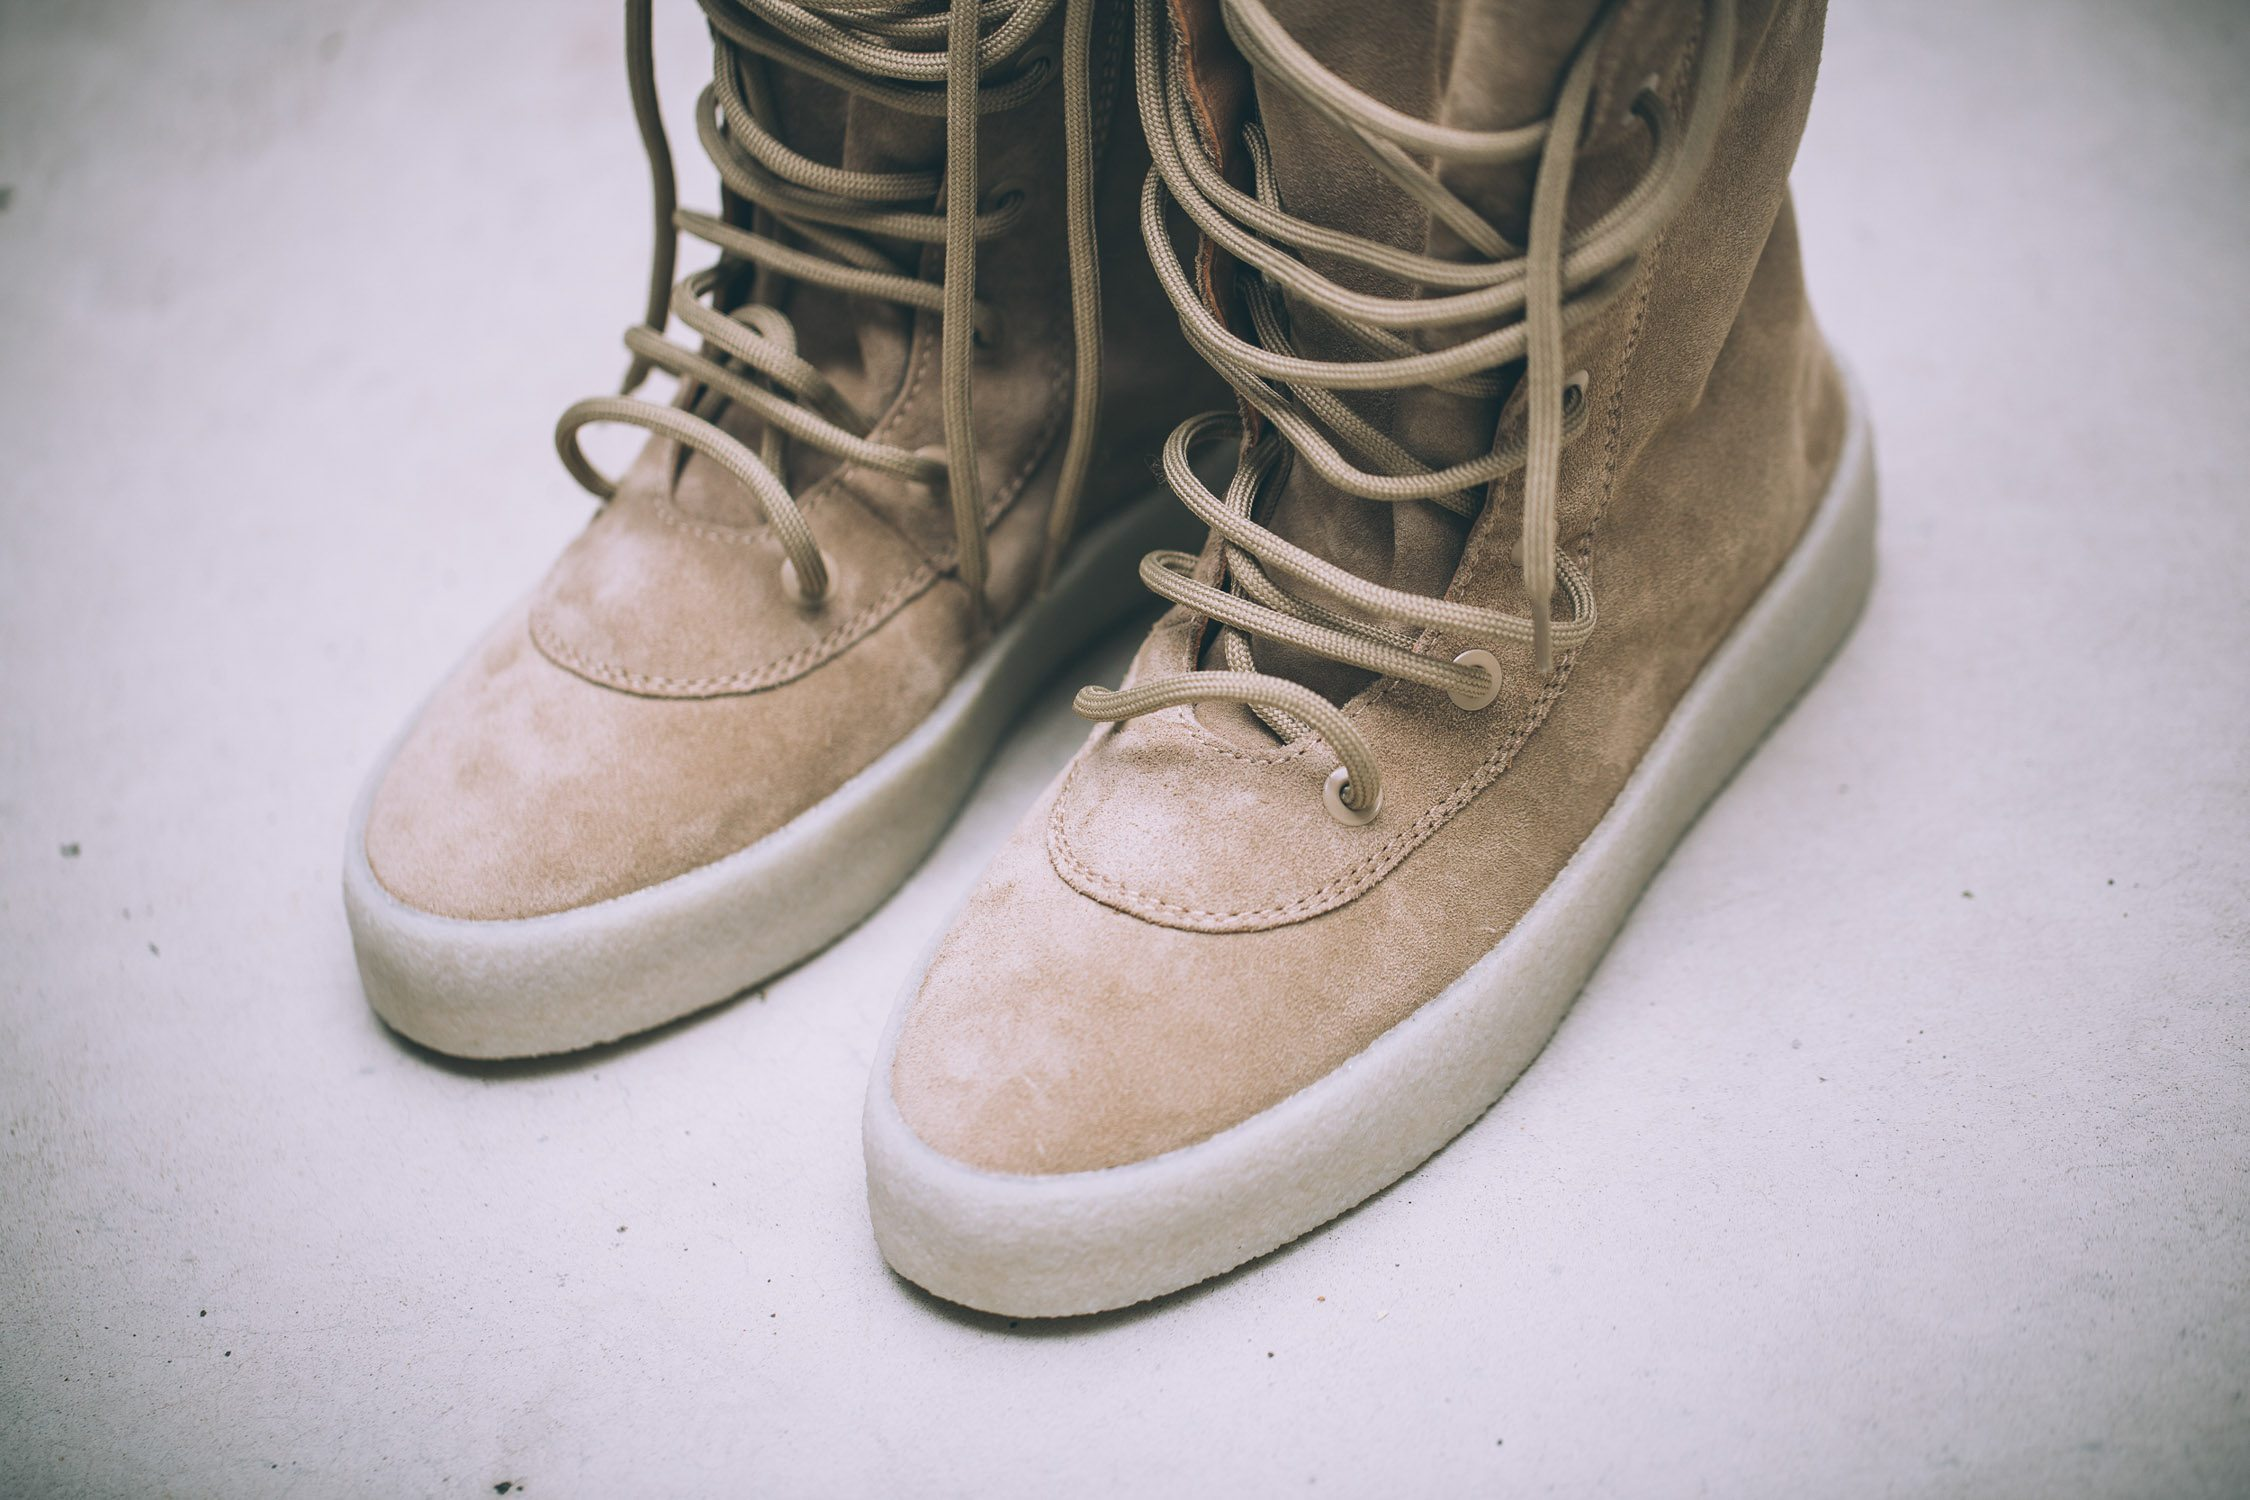 adidas Originals x Kanye West Crepe Boot 4